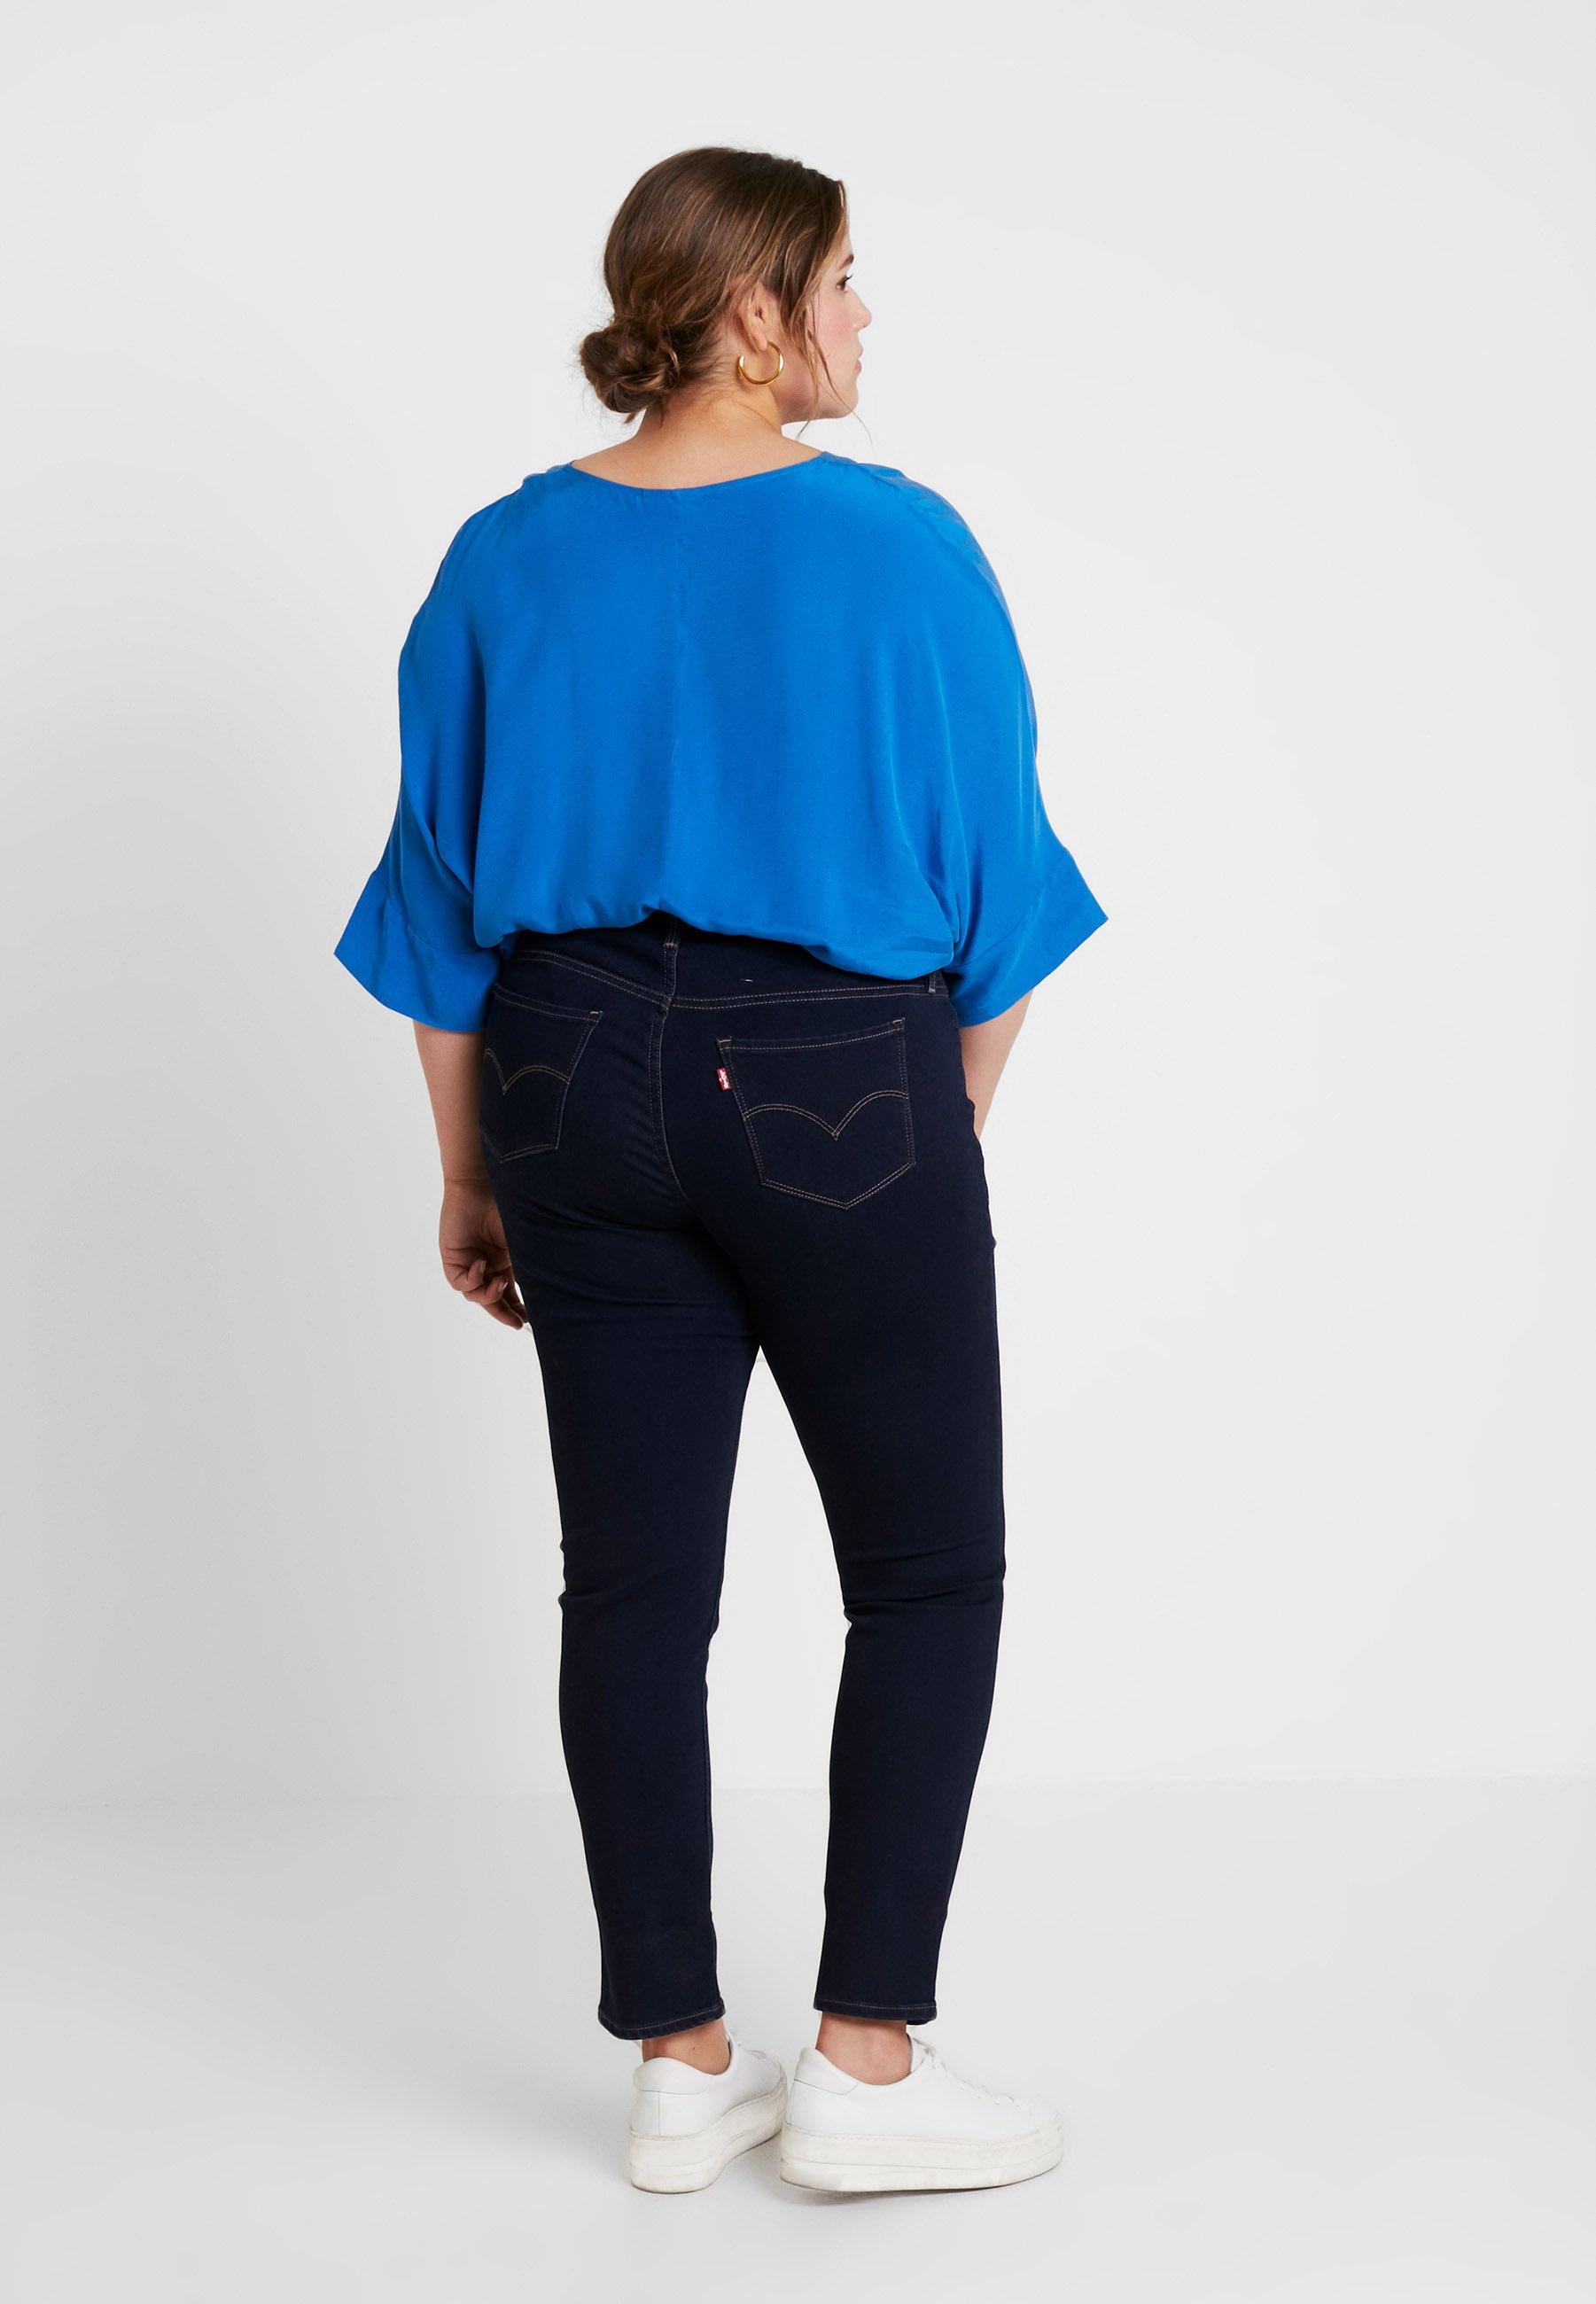 Shaping SkinnyJeans Levi's® Open Pl Ocean 311 Plus OXuiZPk